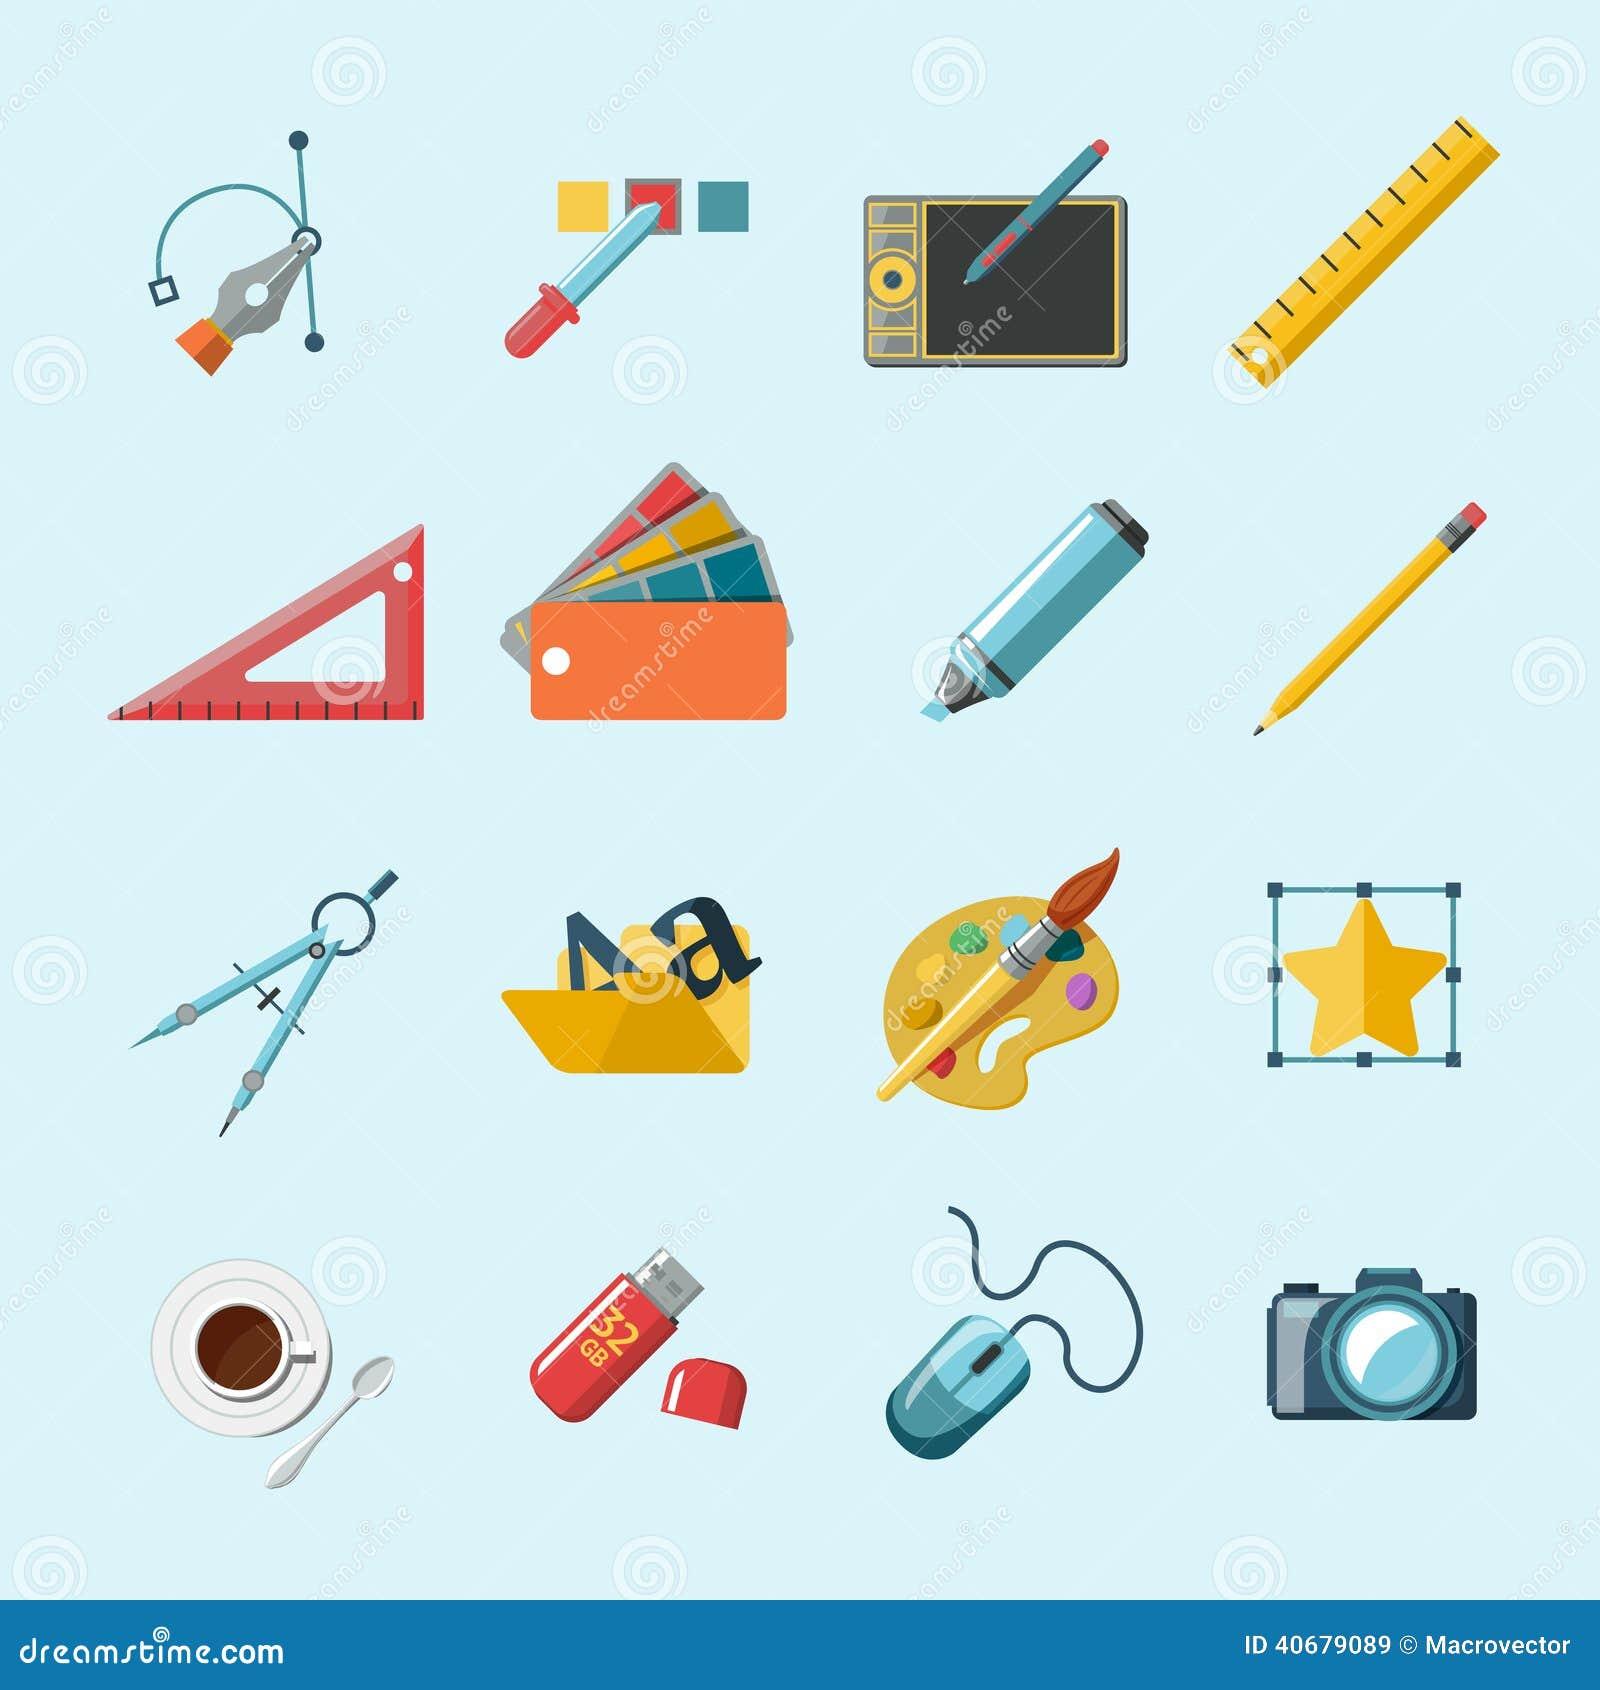 Web design tools vector illustration 28 images web for Free website planning tool